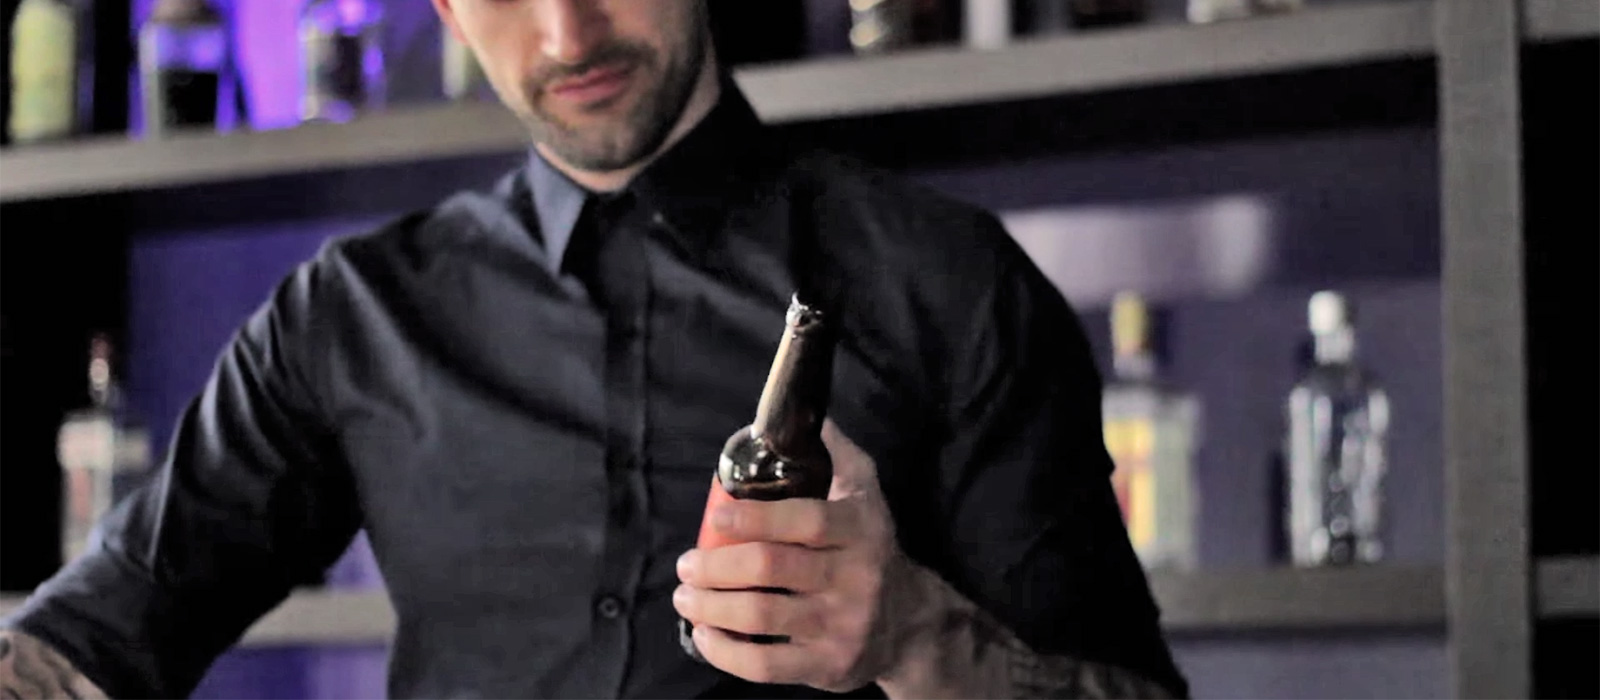 Siris MicroΒrewery | Μικροζυθοποιία Σερρών & Β. Ελλάδος Ε.Ε. | Ελληνική Μικροζυθοποιία, Μικροζυθοποιία στις Σέρρες | Voreia Beer, Μπύρα Voreia - Η μπύρα της Βορείου Ελλάδος